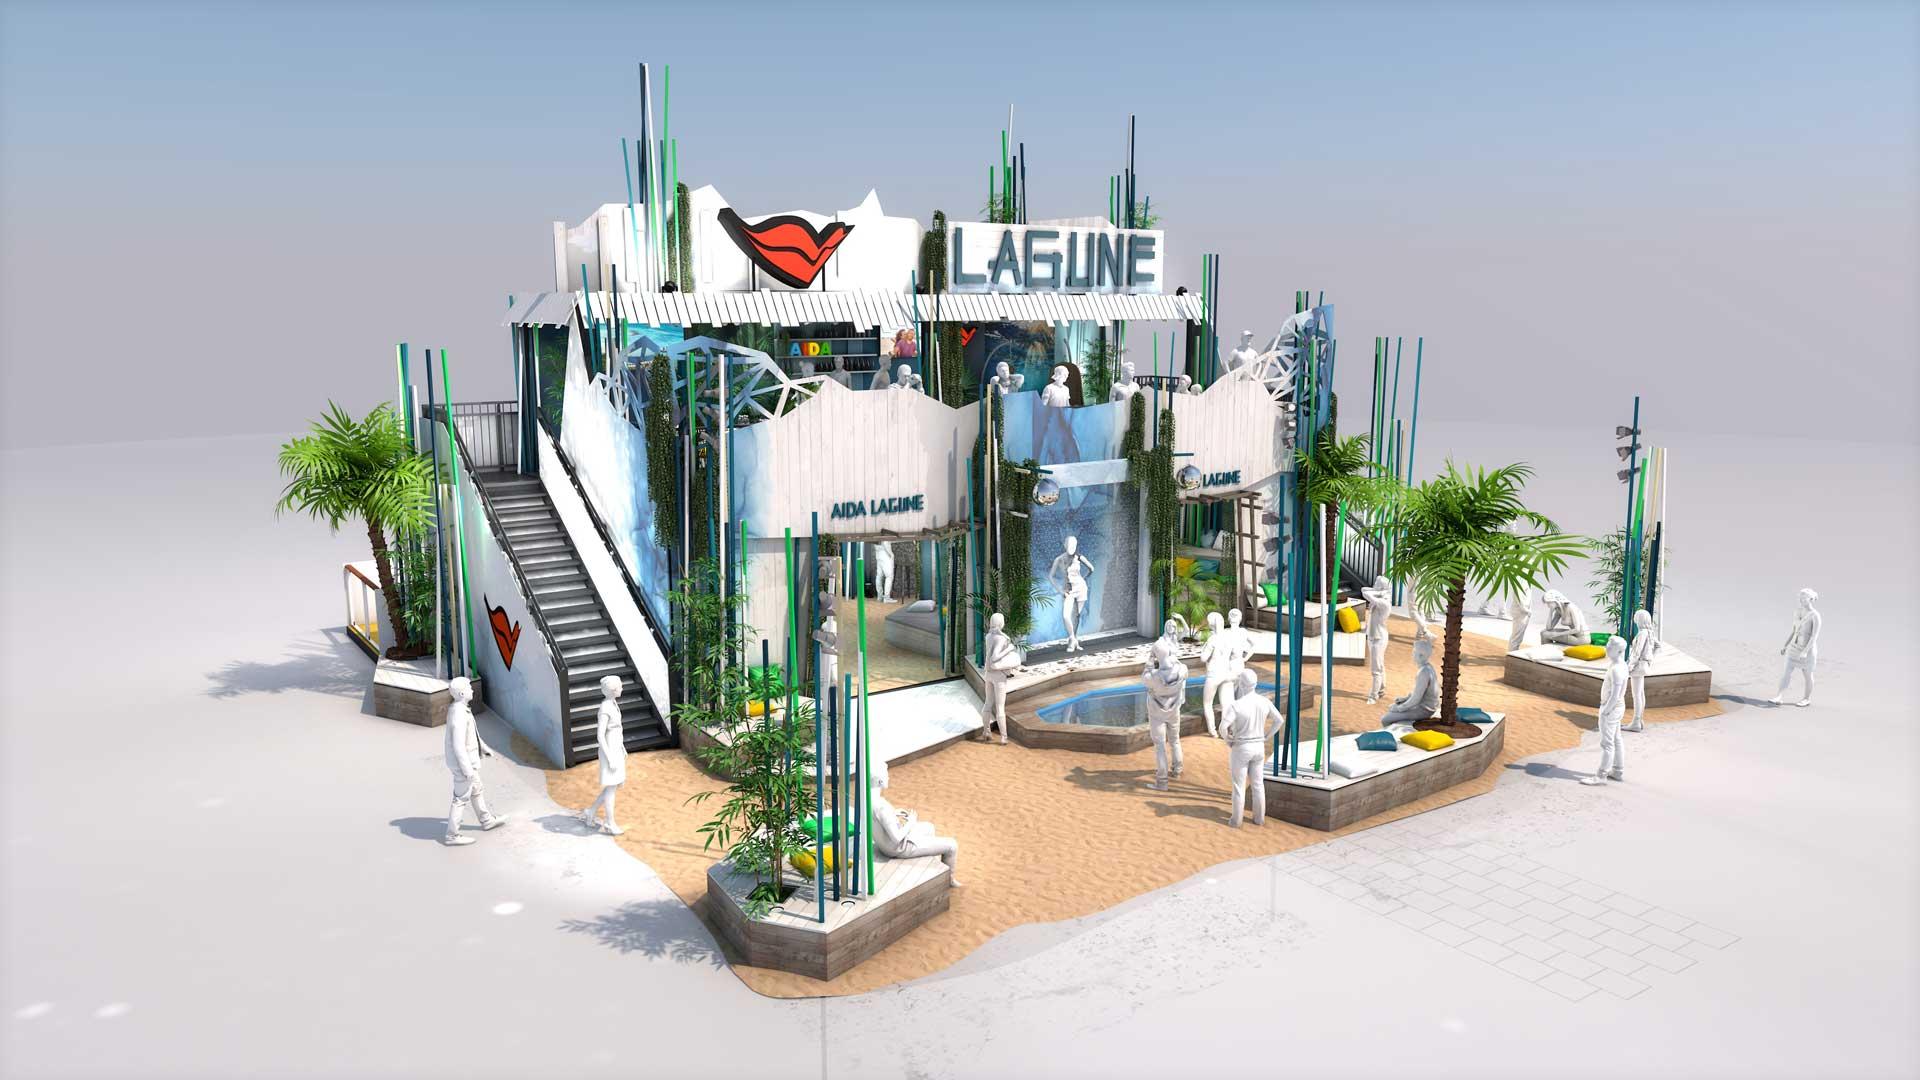 Festival-Container-Eventarchitektur-Eventcontainer-AIDA - Konzept Festival 2